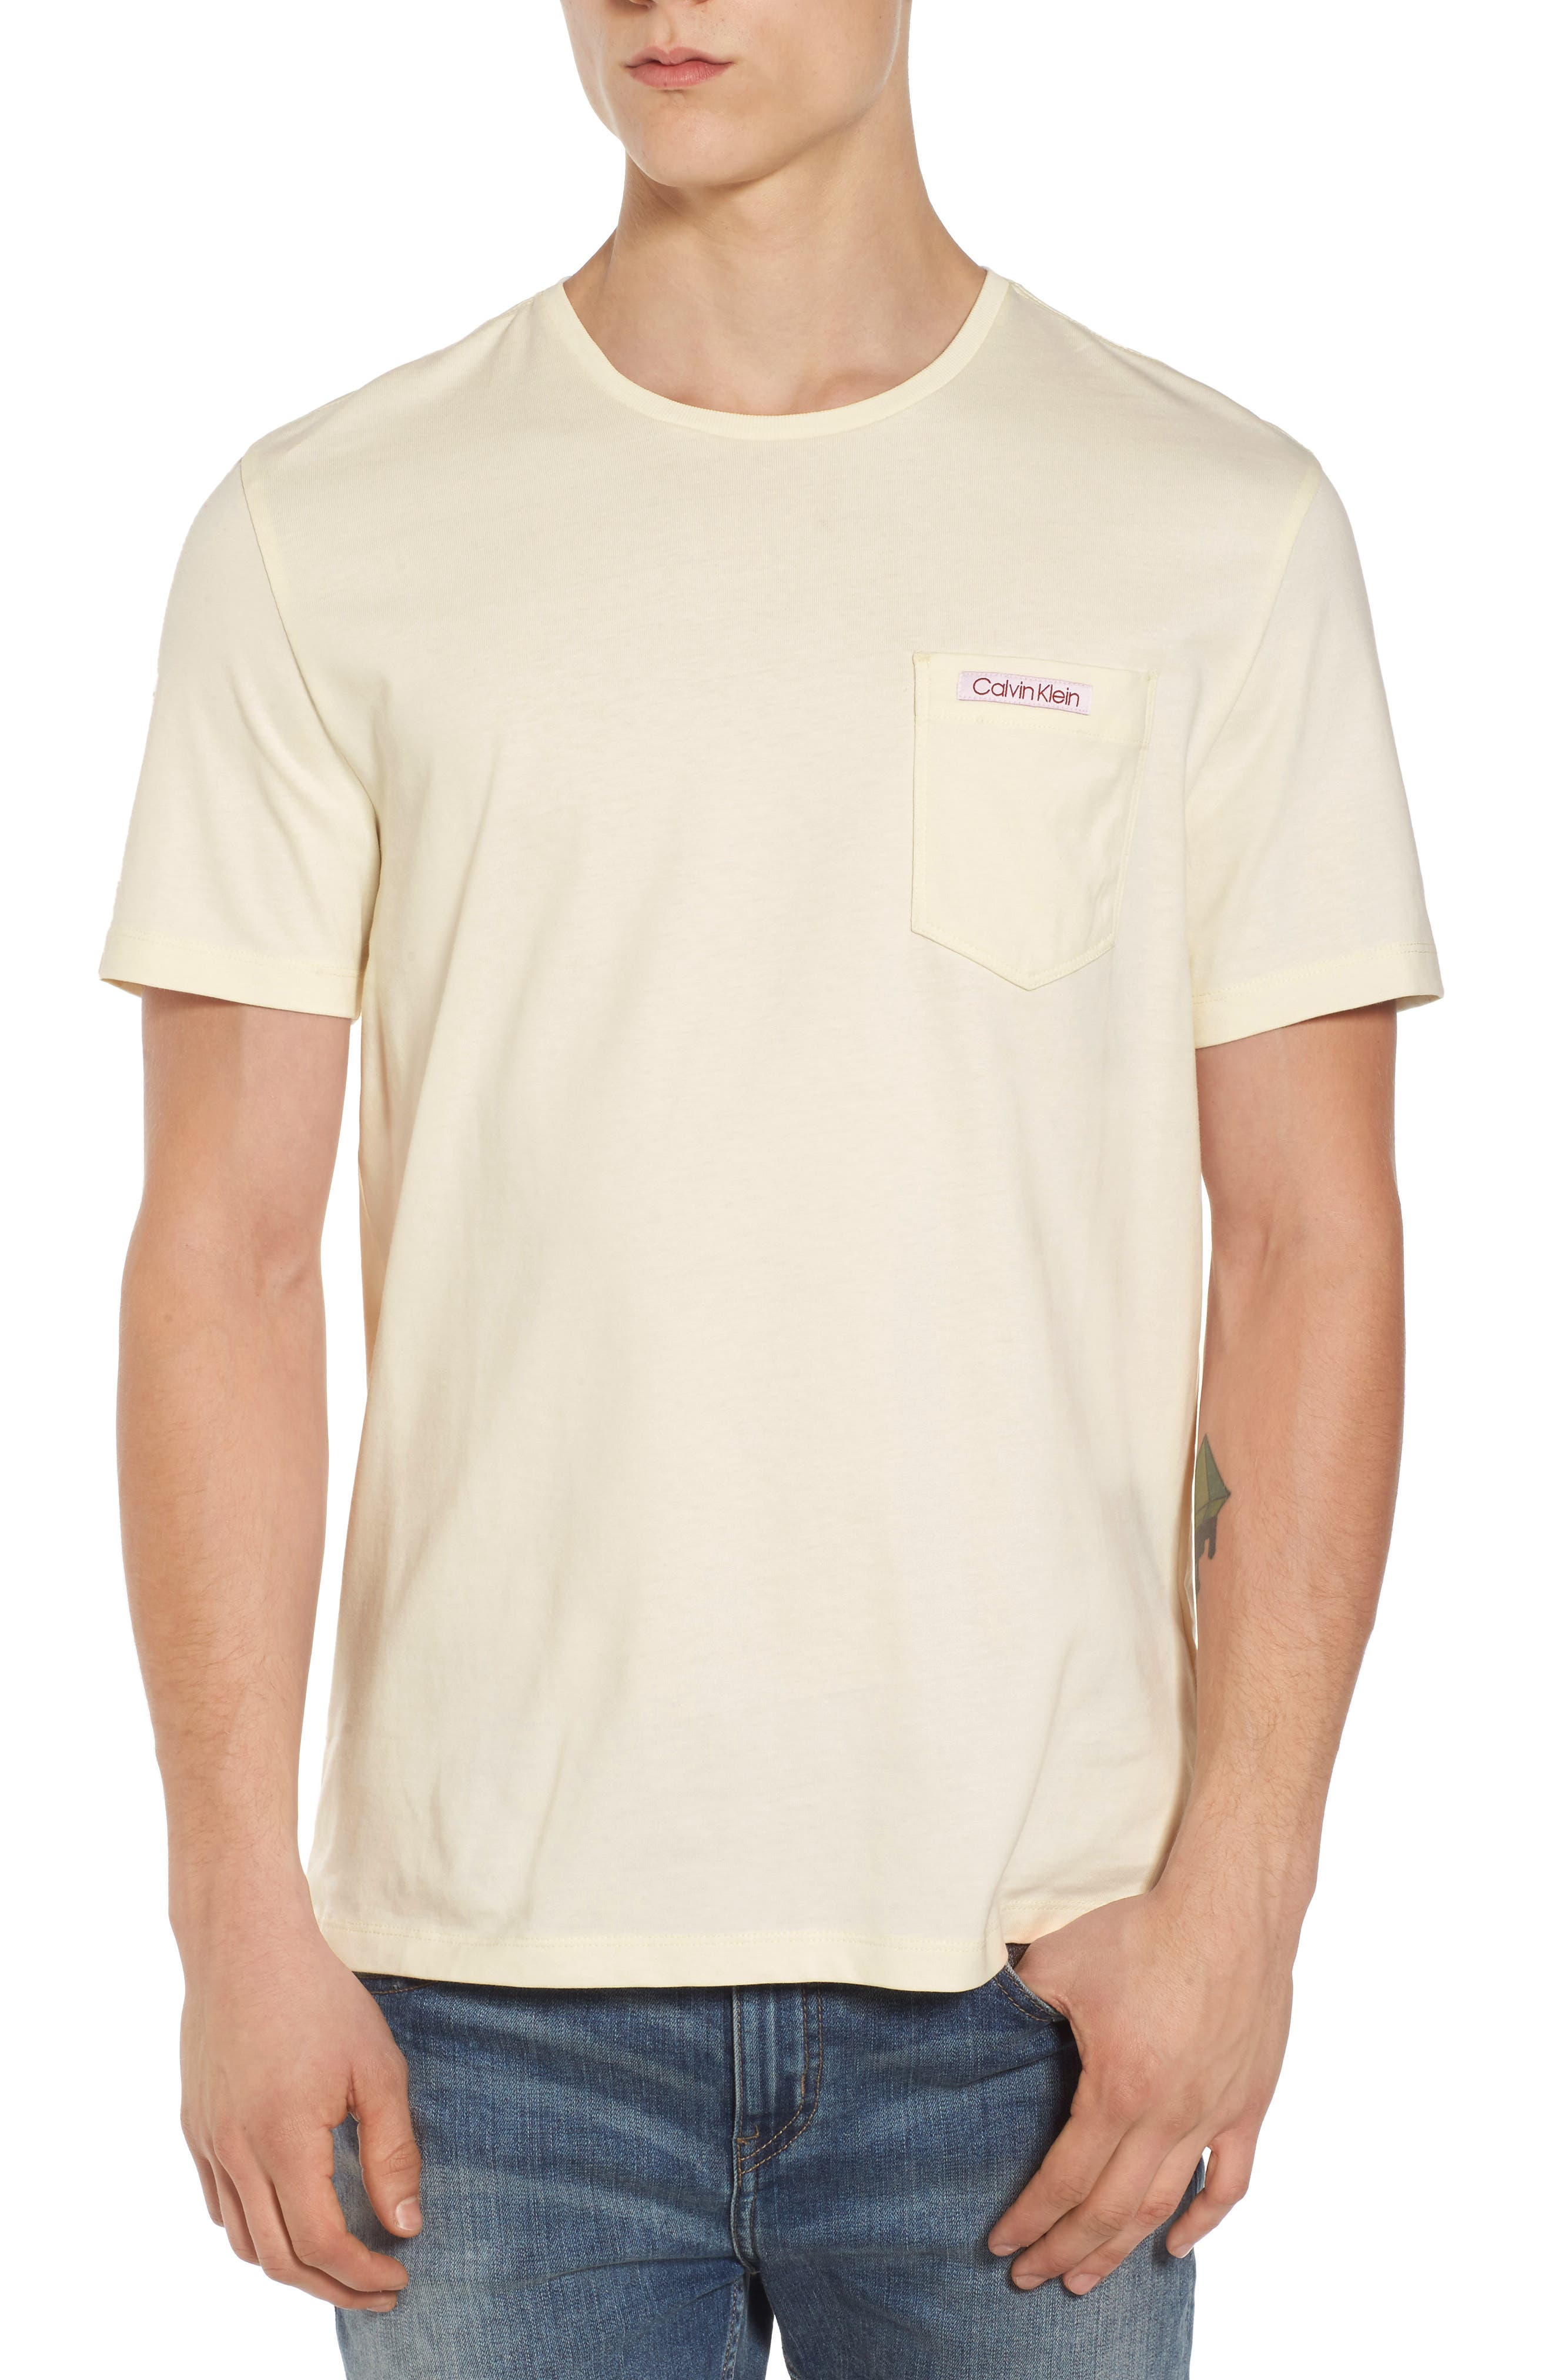 Calvin Klein Jeans Label Pocket T-Shirt